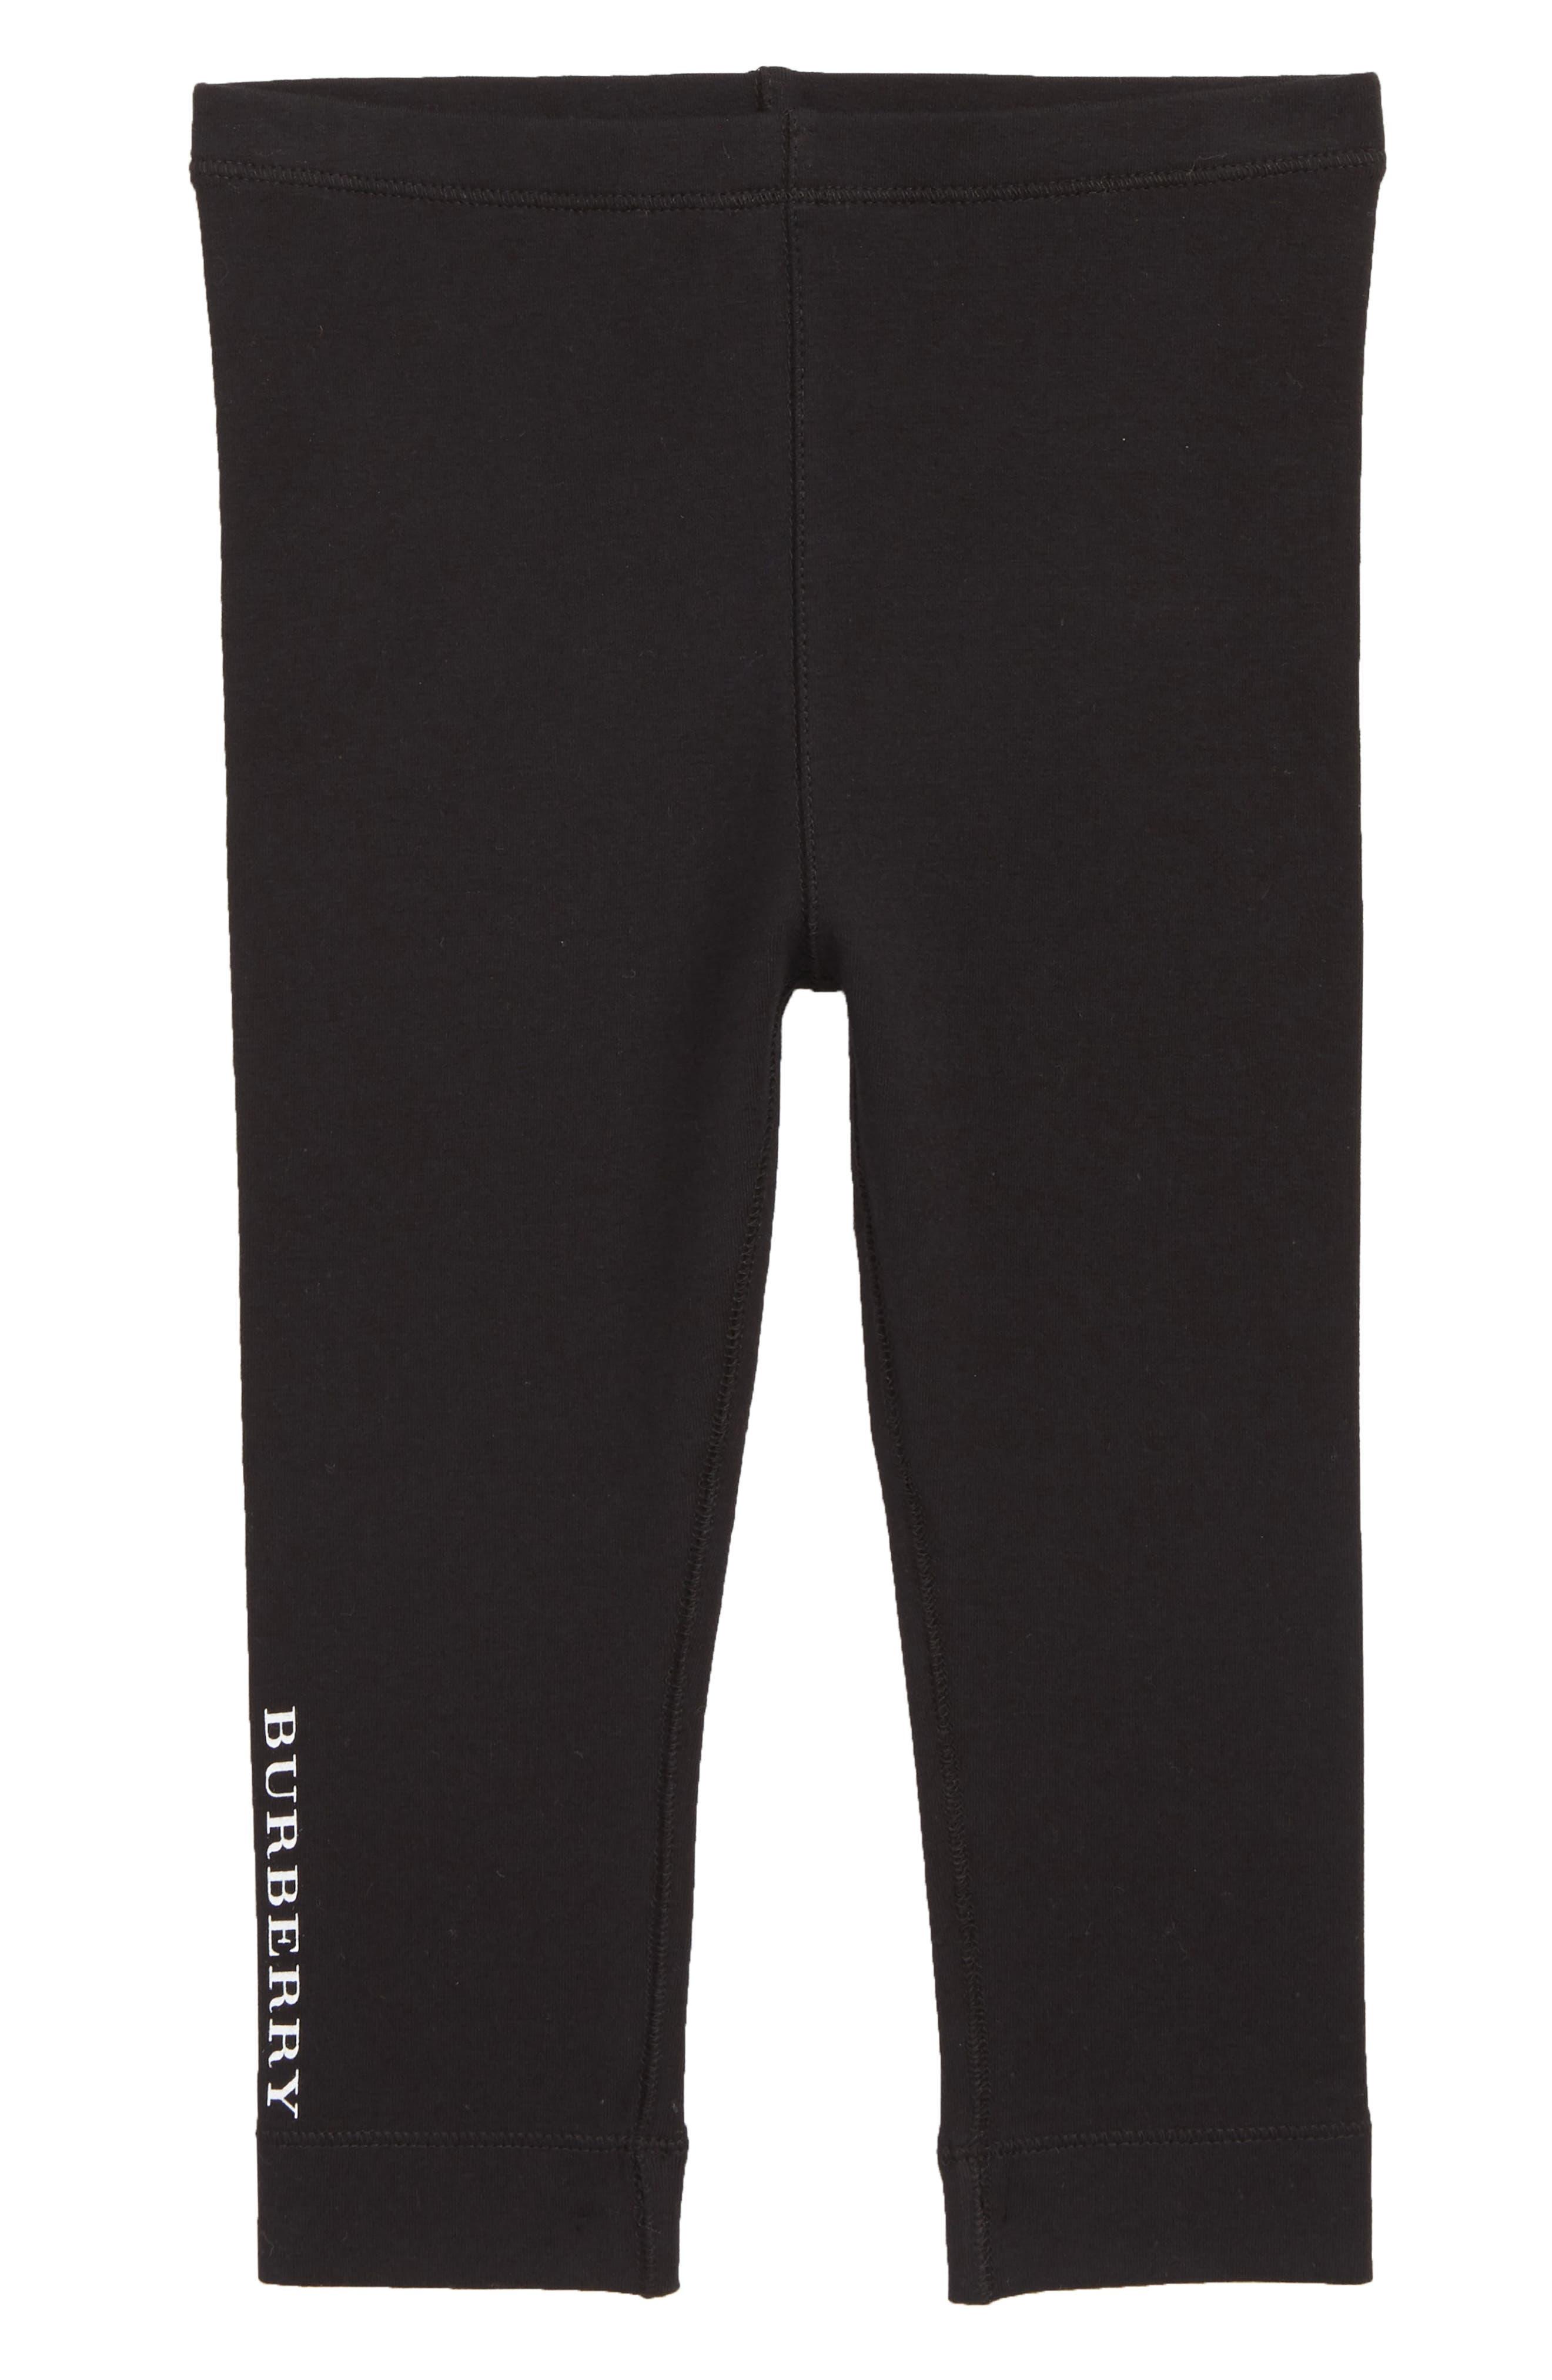 BURBERRY Penny Logo Leggings, Main, color, BLACK